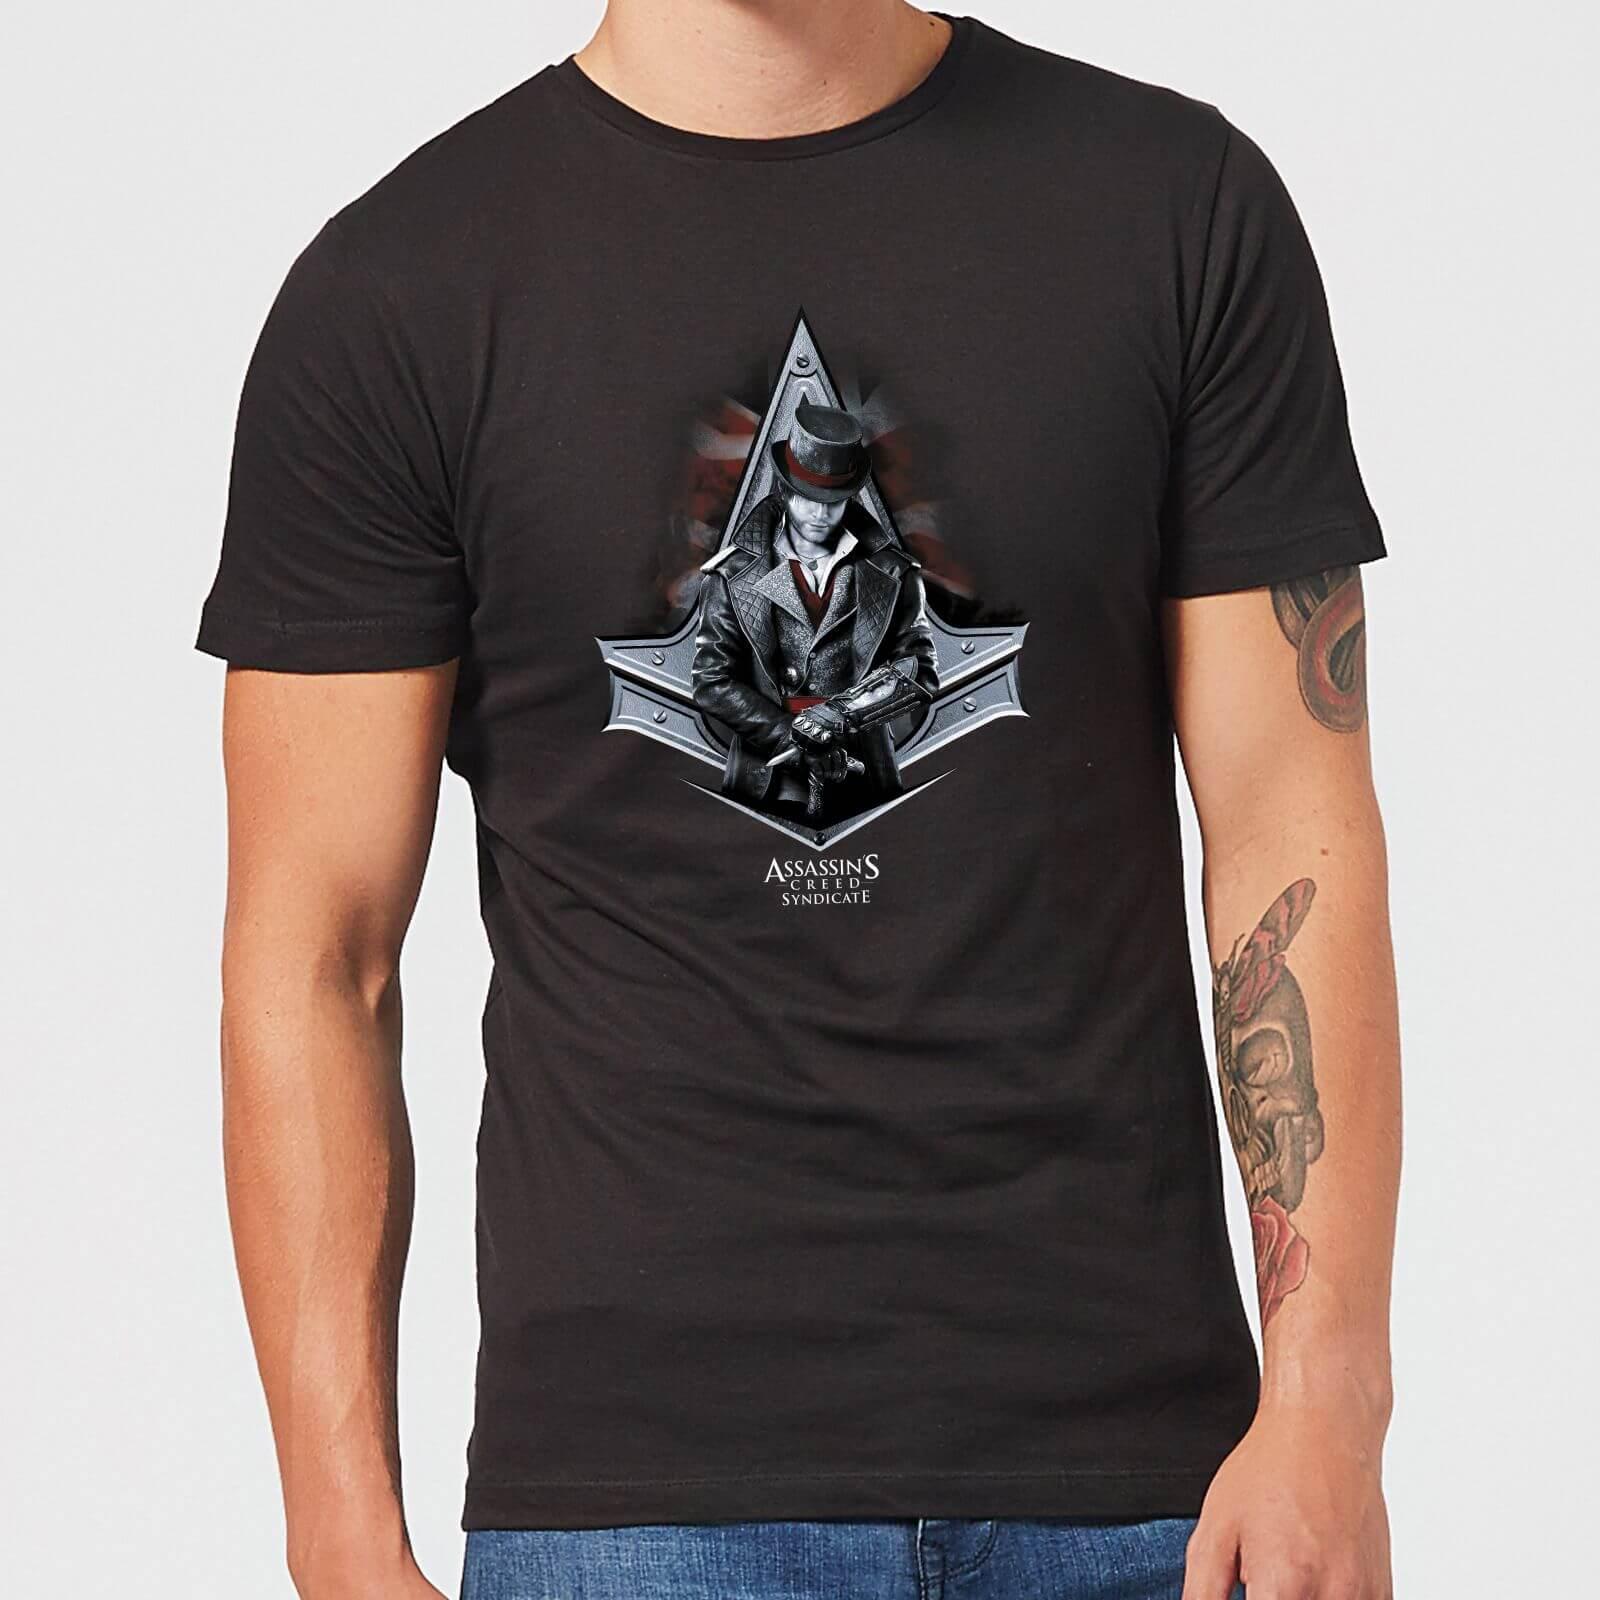 Assassin's Creed T-Shirt Homme Jacob Assassin's Creed Syndicate - Noir - XL - Noir